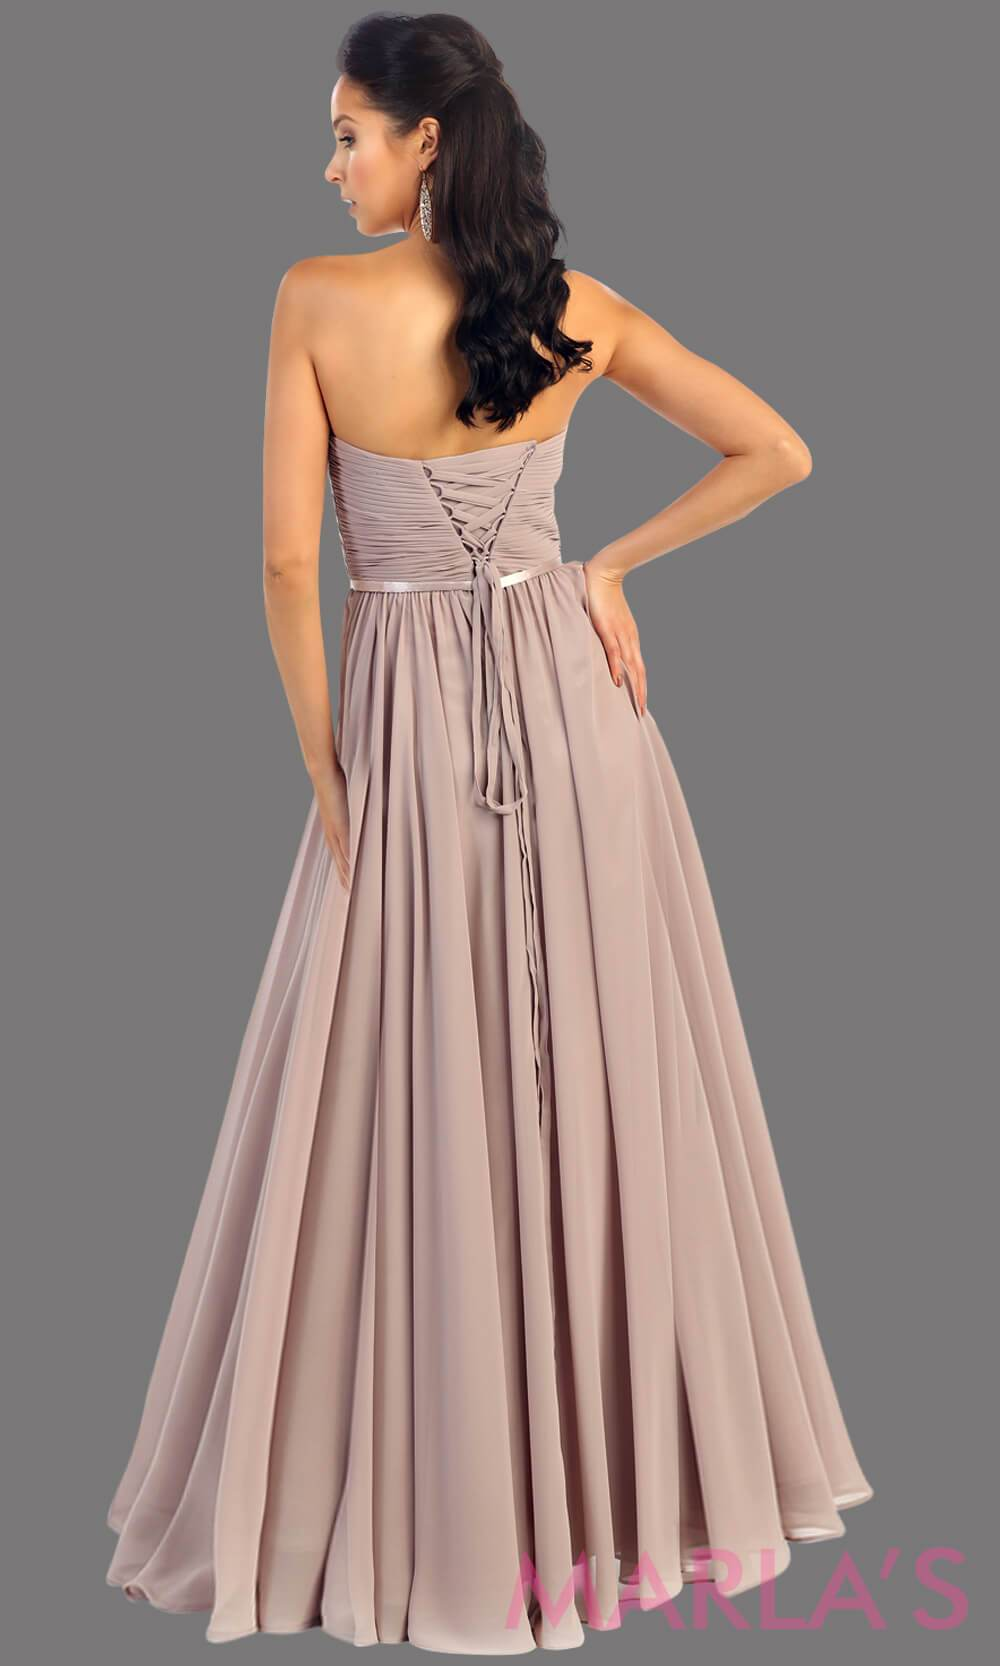 corset back marlas fashion.jpg